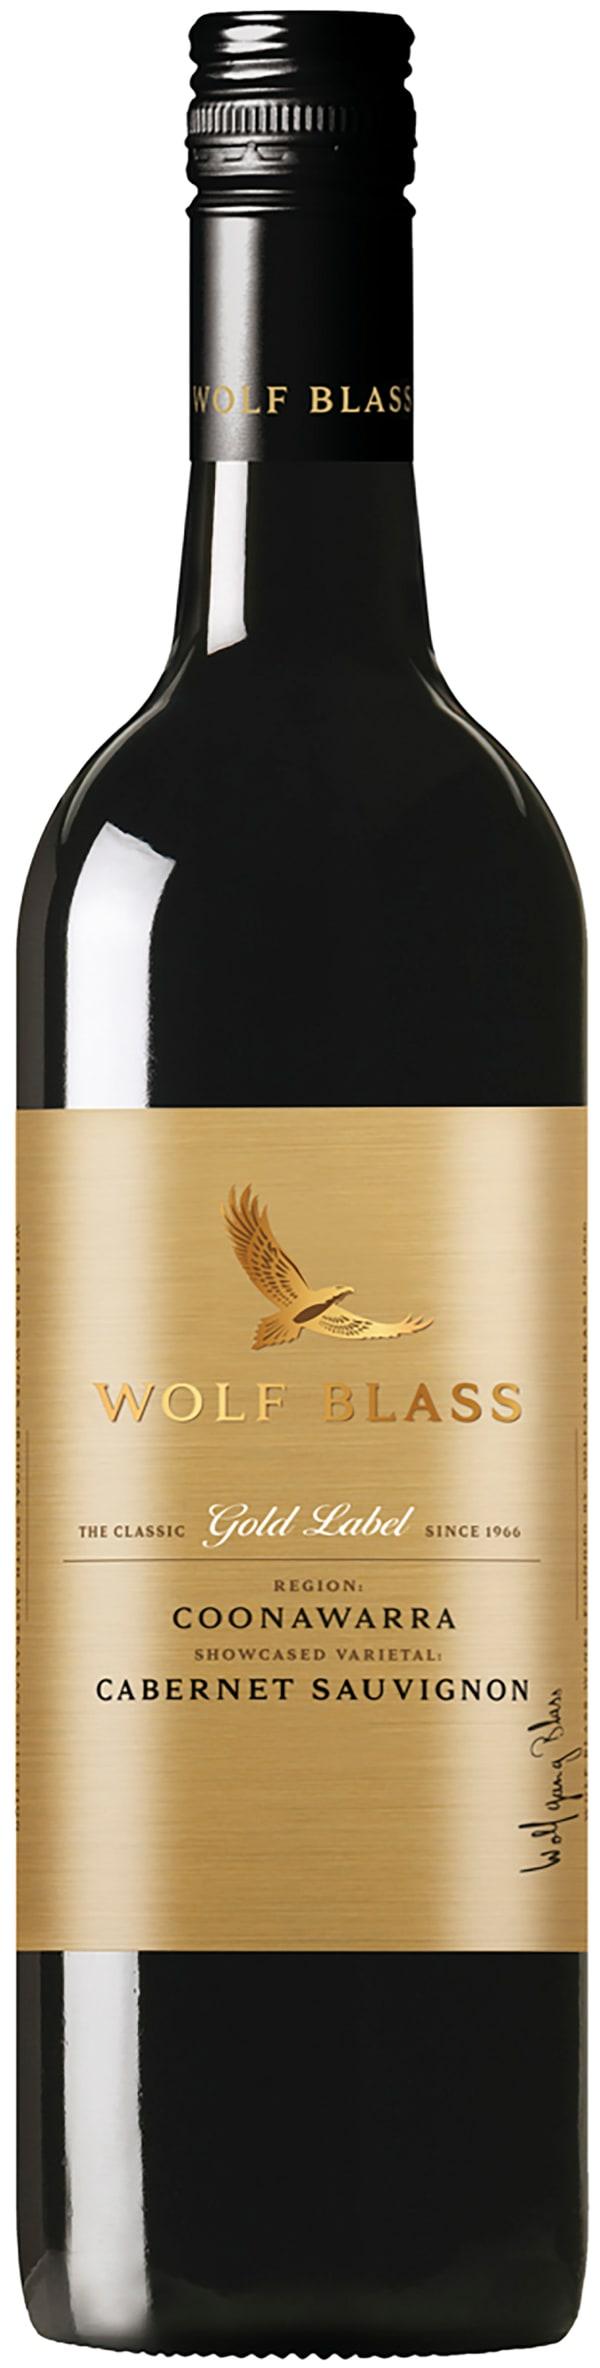 Wolf Blass Gold Label Cabernet Sauvignon 2014